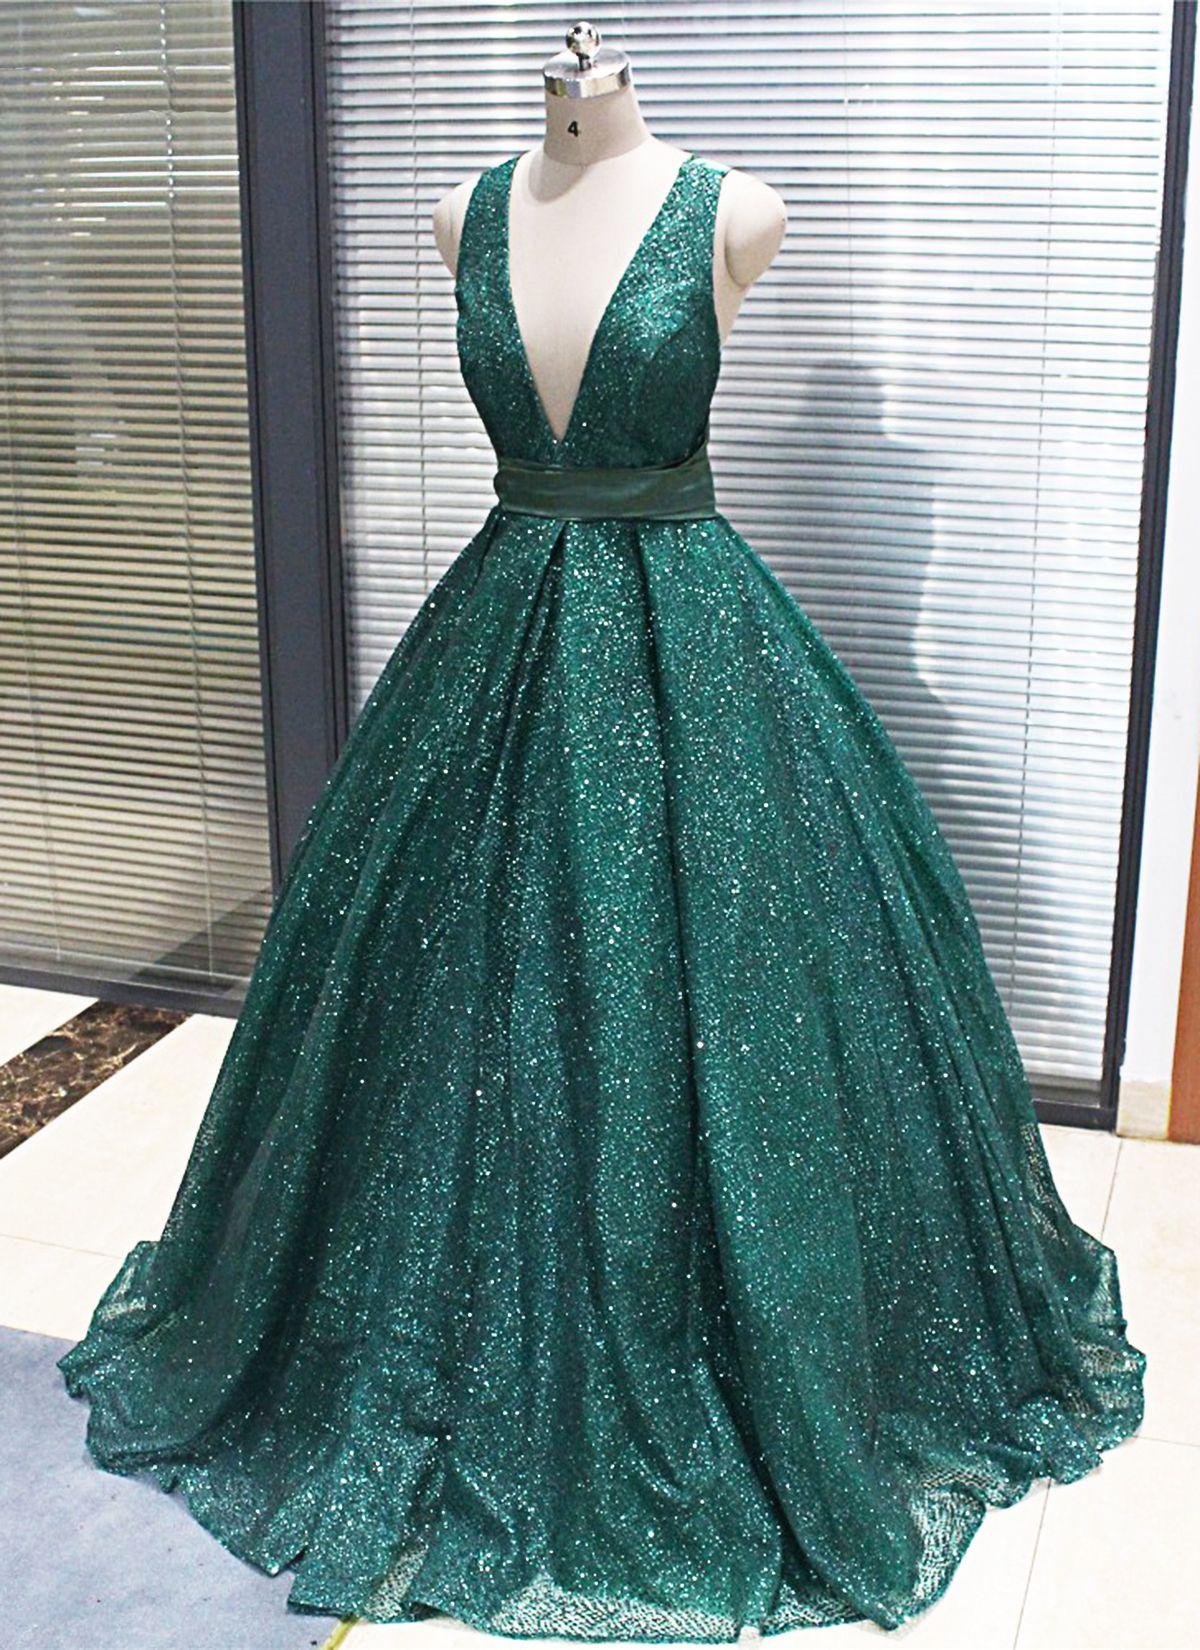 2019 sparkly dark green sequined long v neck evening dress